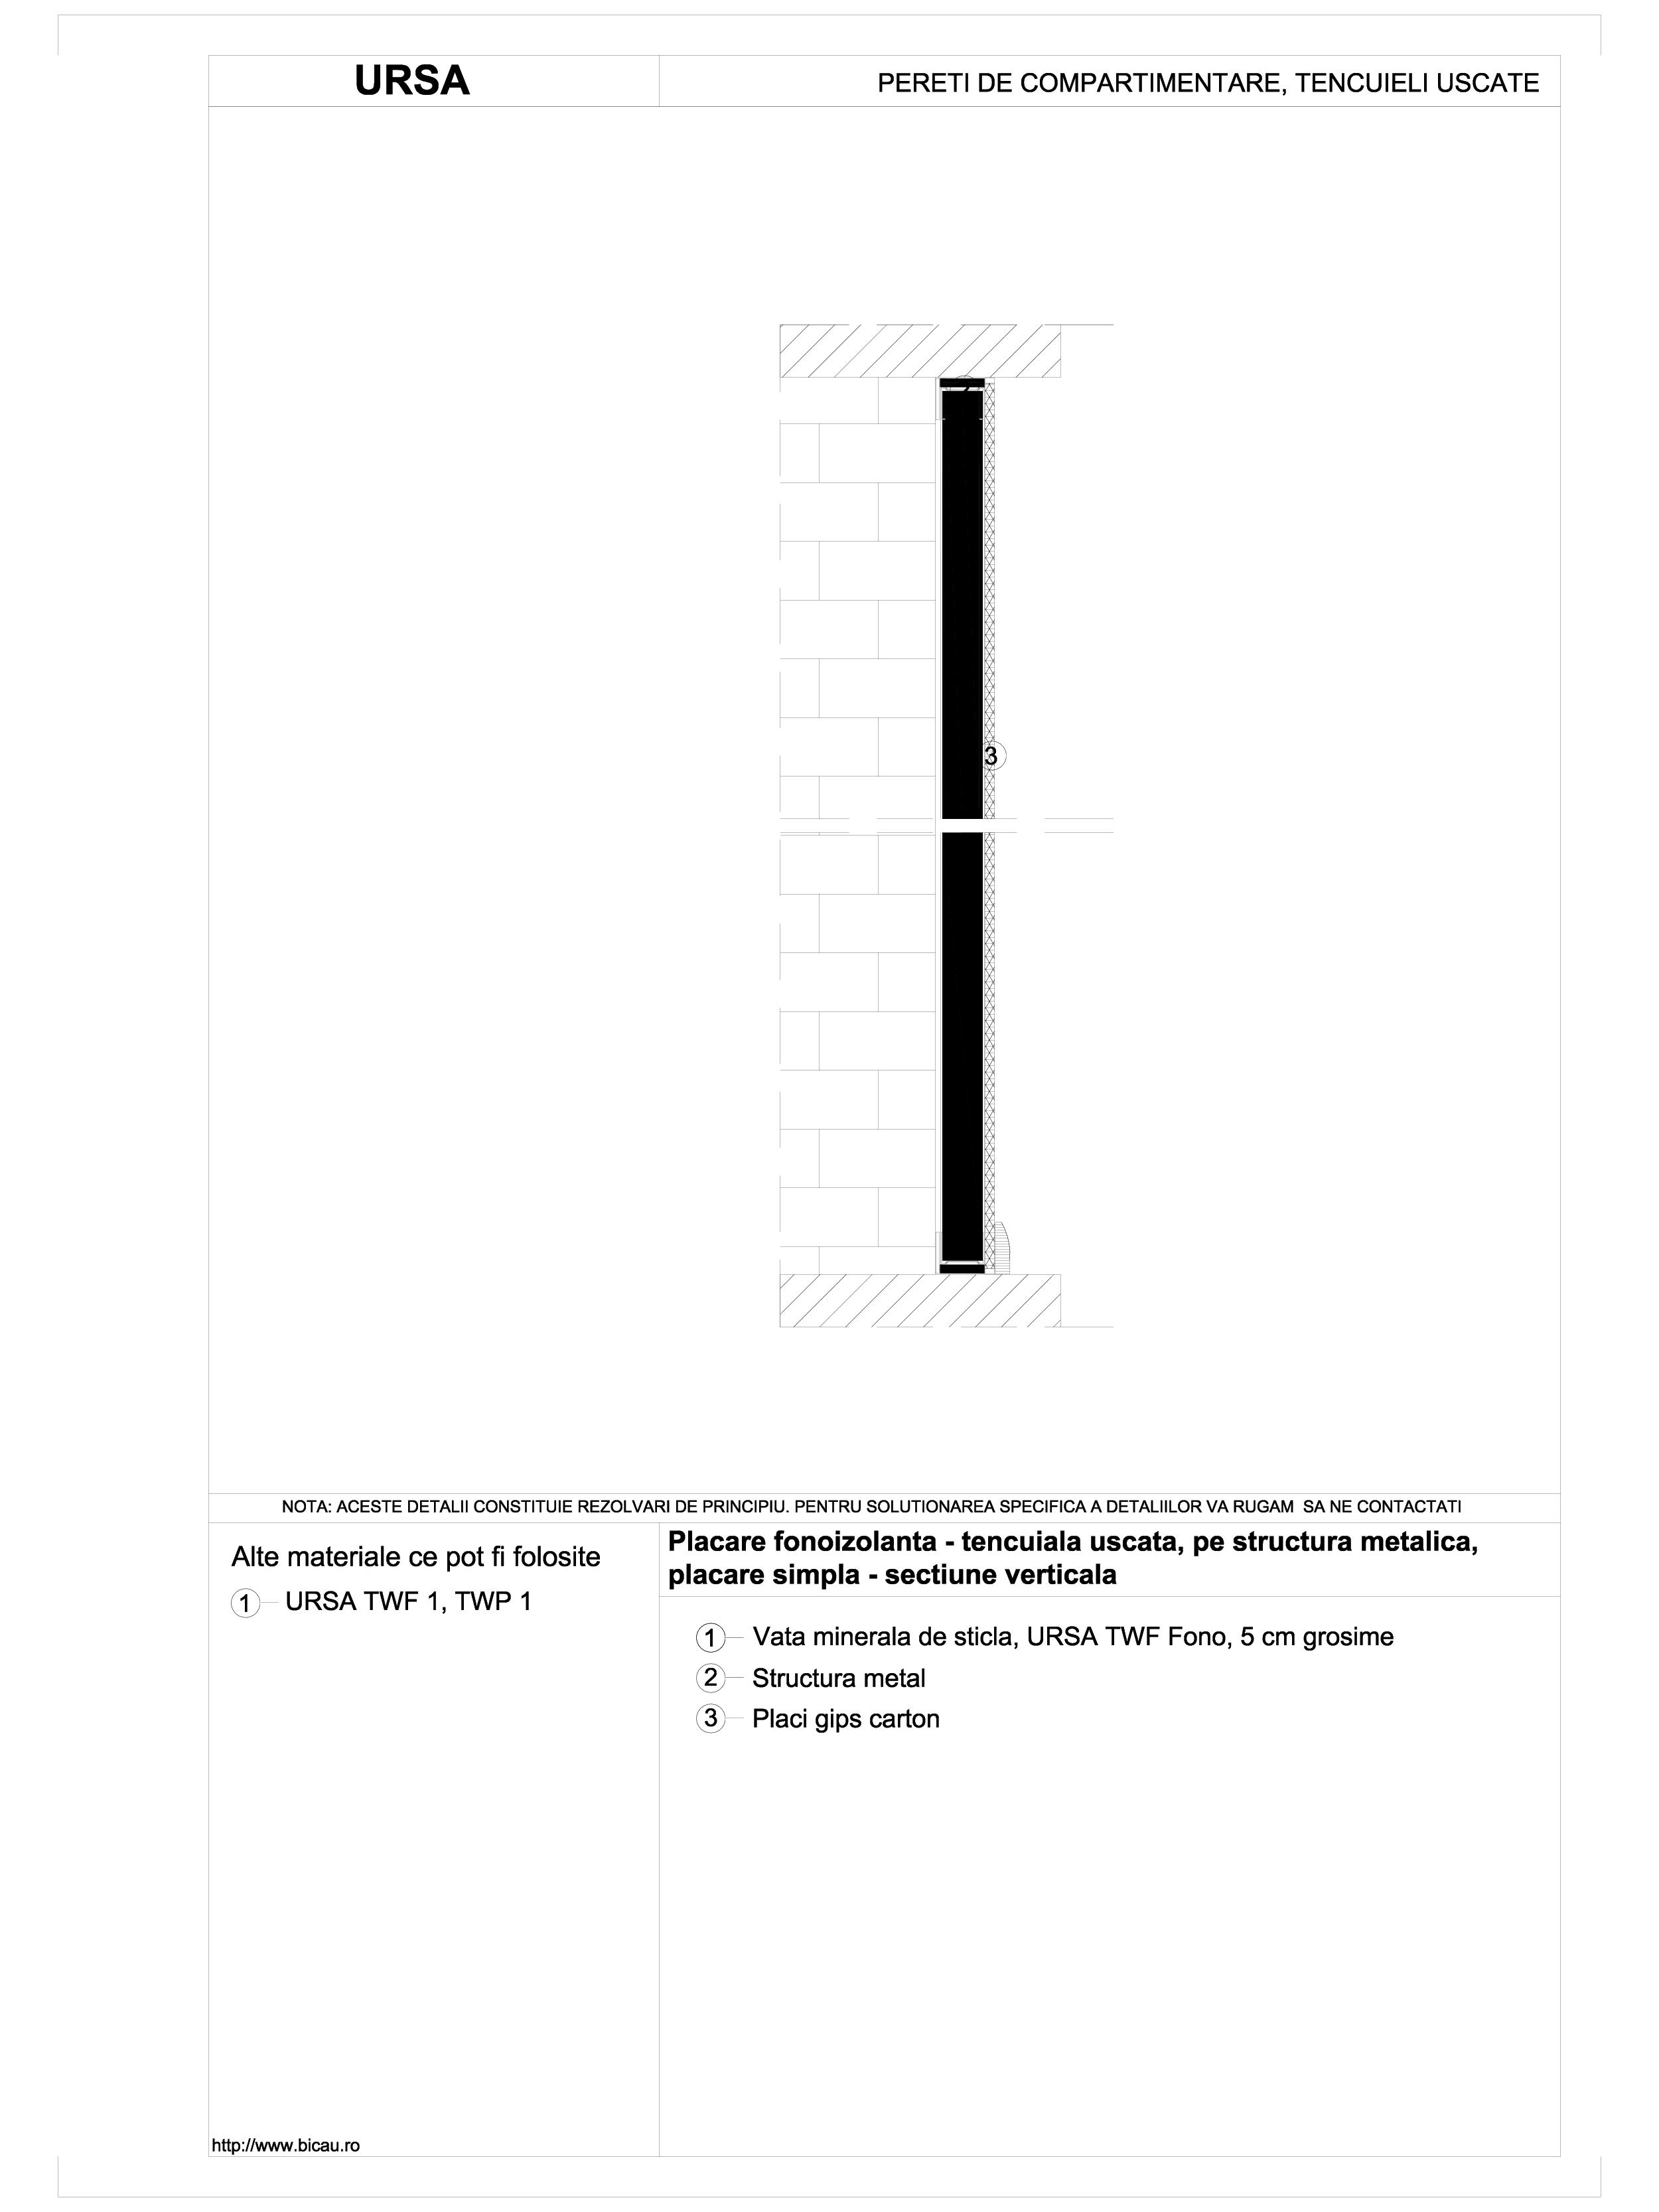 Placare fonoizolanta - tencuiala uscata, pe structura metalica, placare simpla - sectiune verticala TWF FONO URSA Vata minerala pentru pereti de compartimentare URSA ROMANIA   - Pagina 1